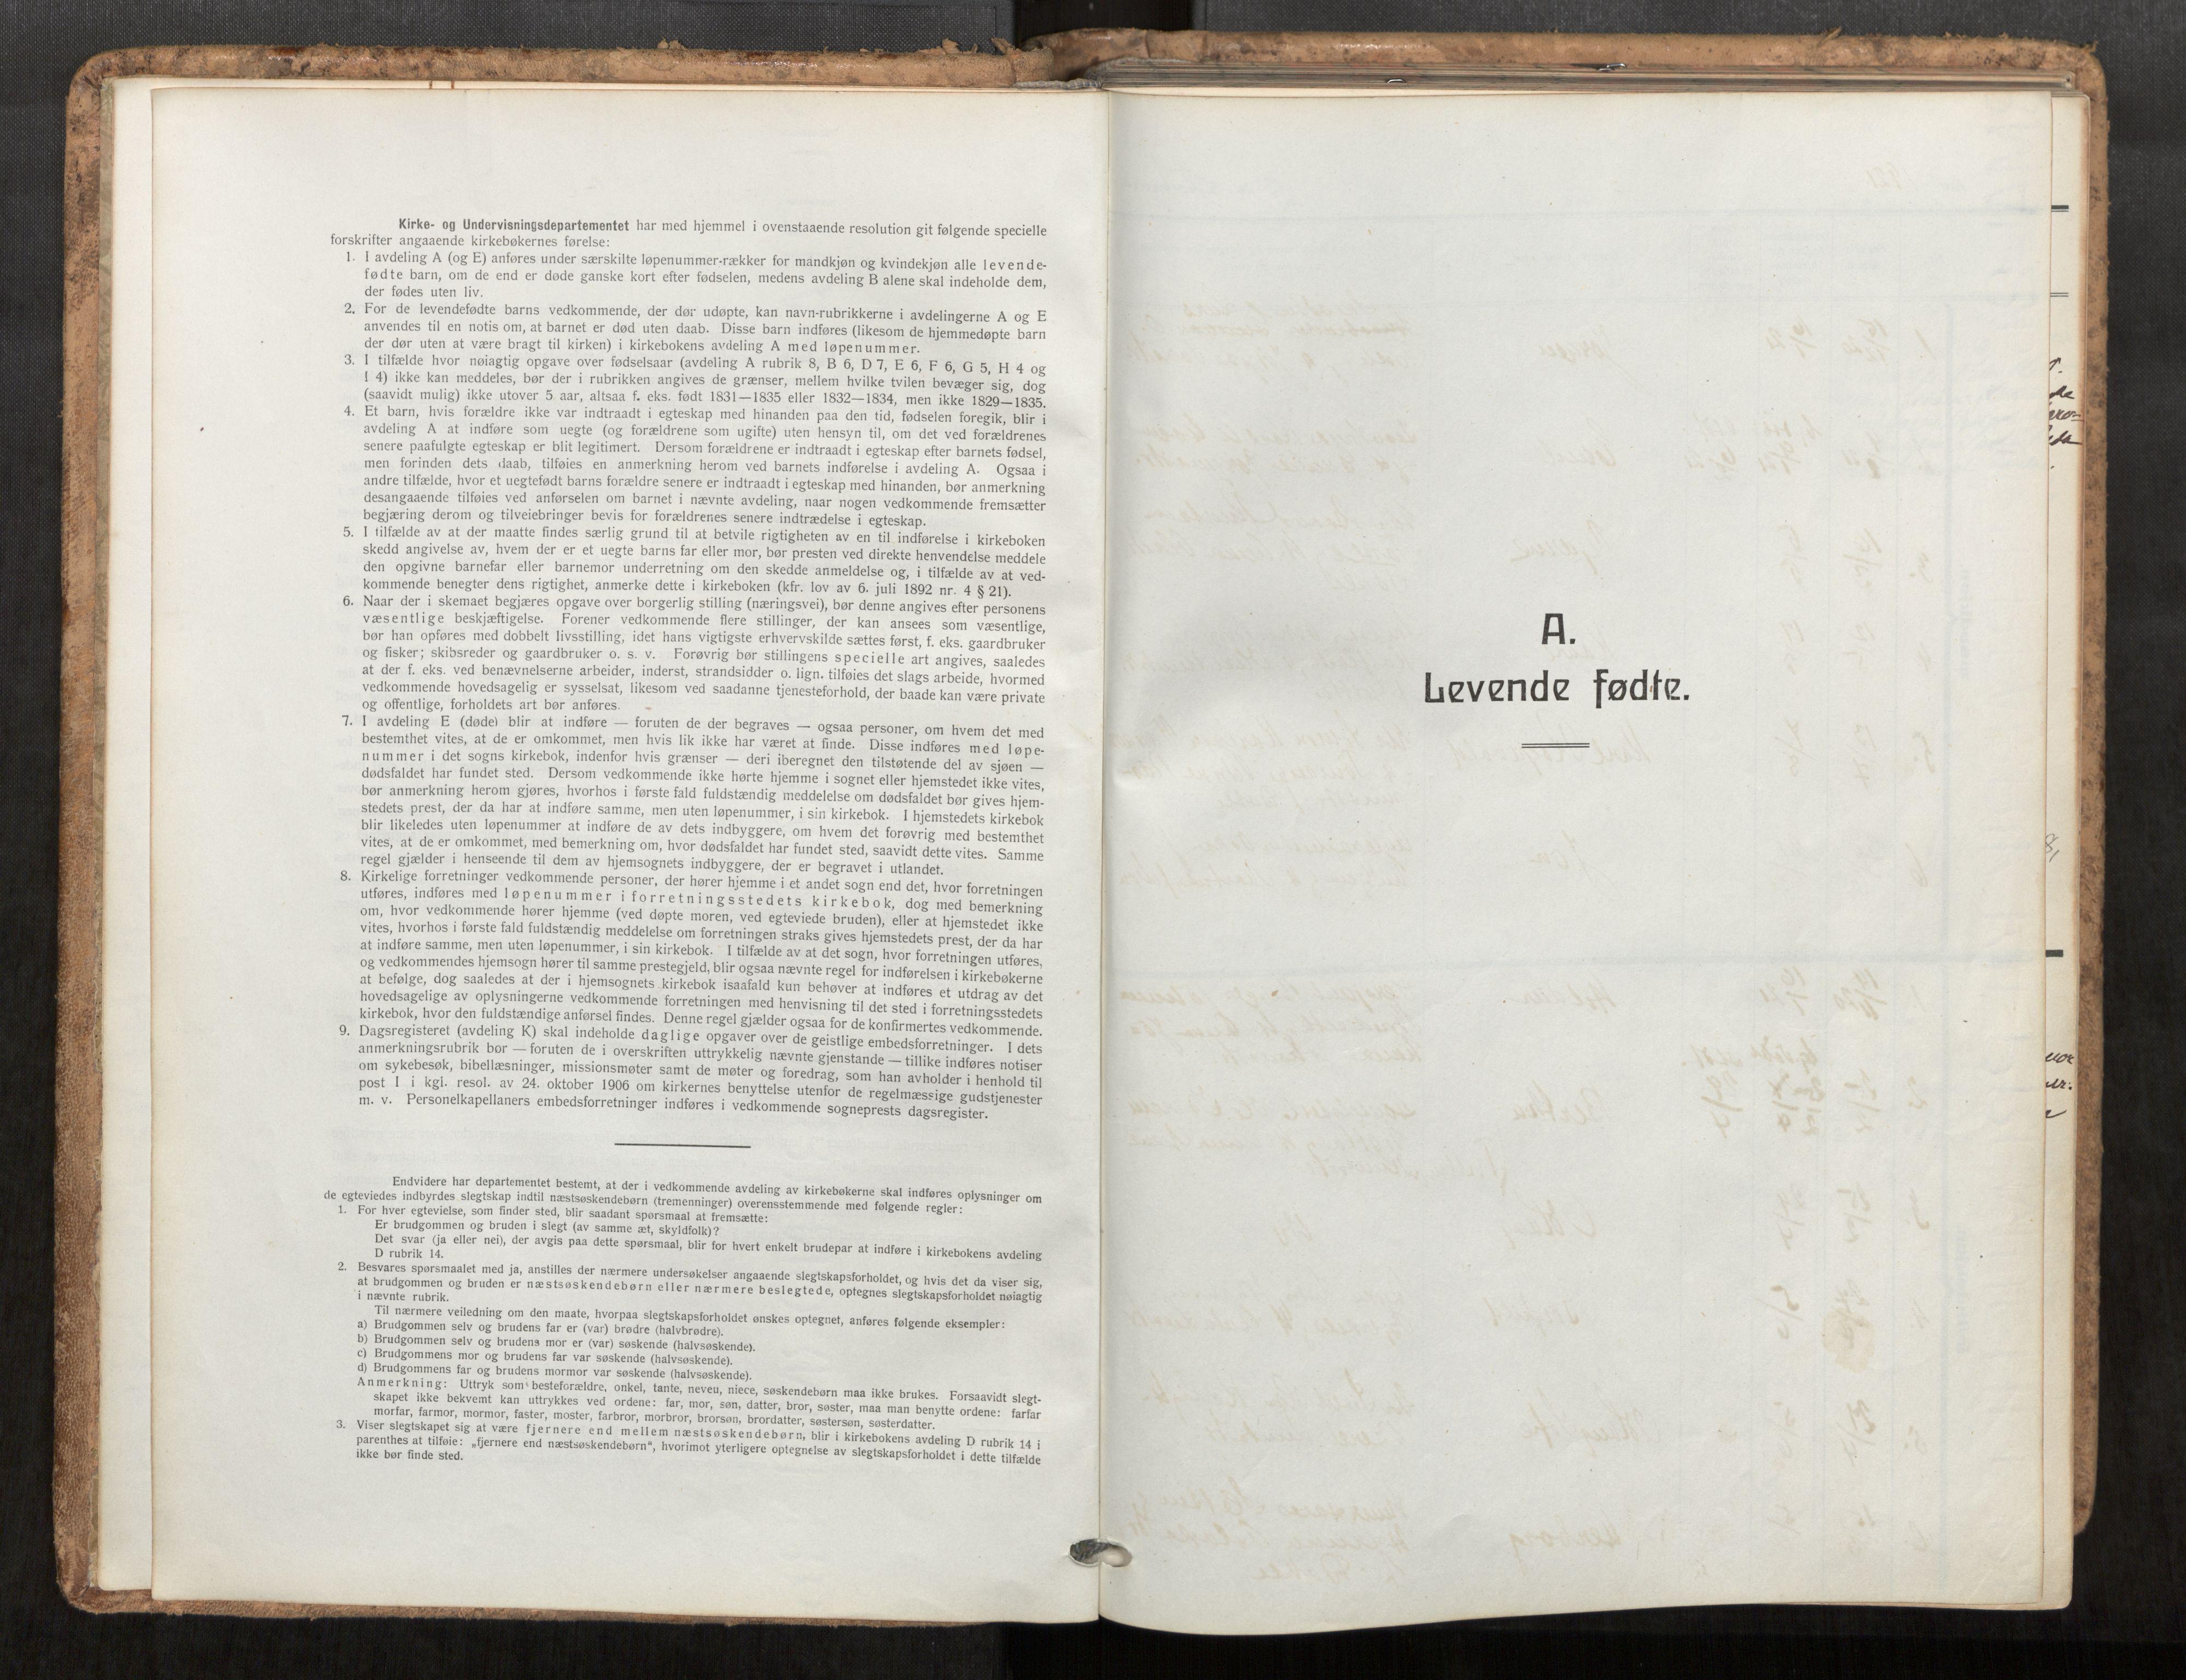 SAT, Grytten sokneprestkontor, Ministerialbok nr. 545A04, 1921-1956